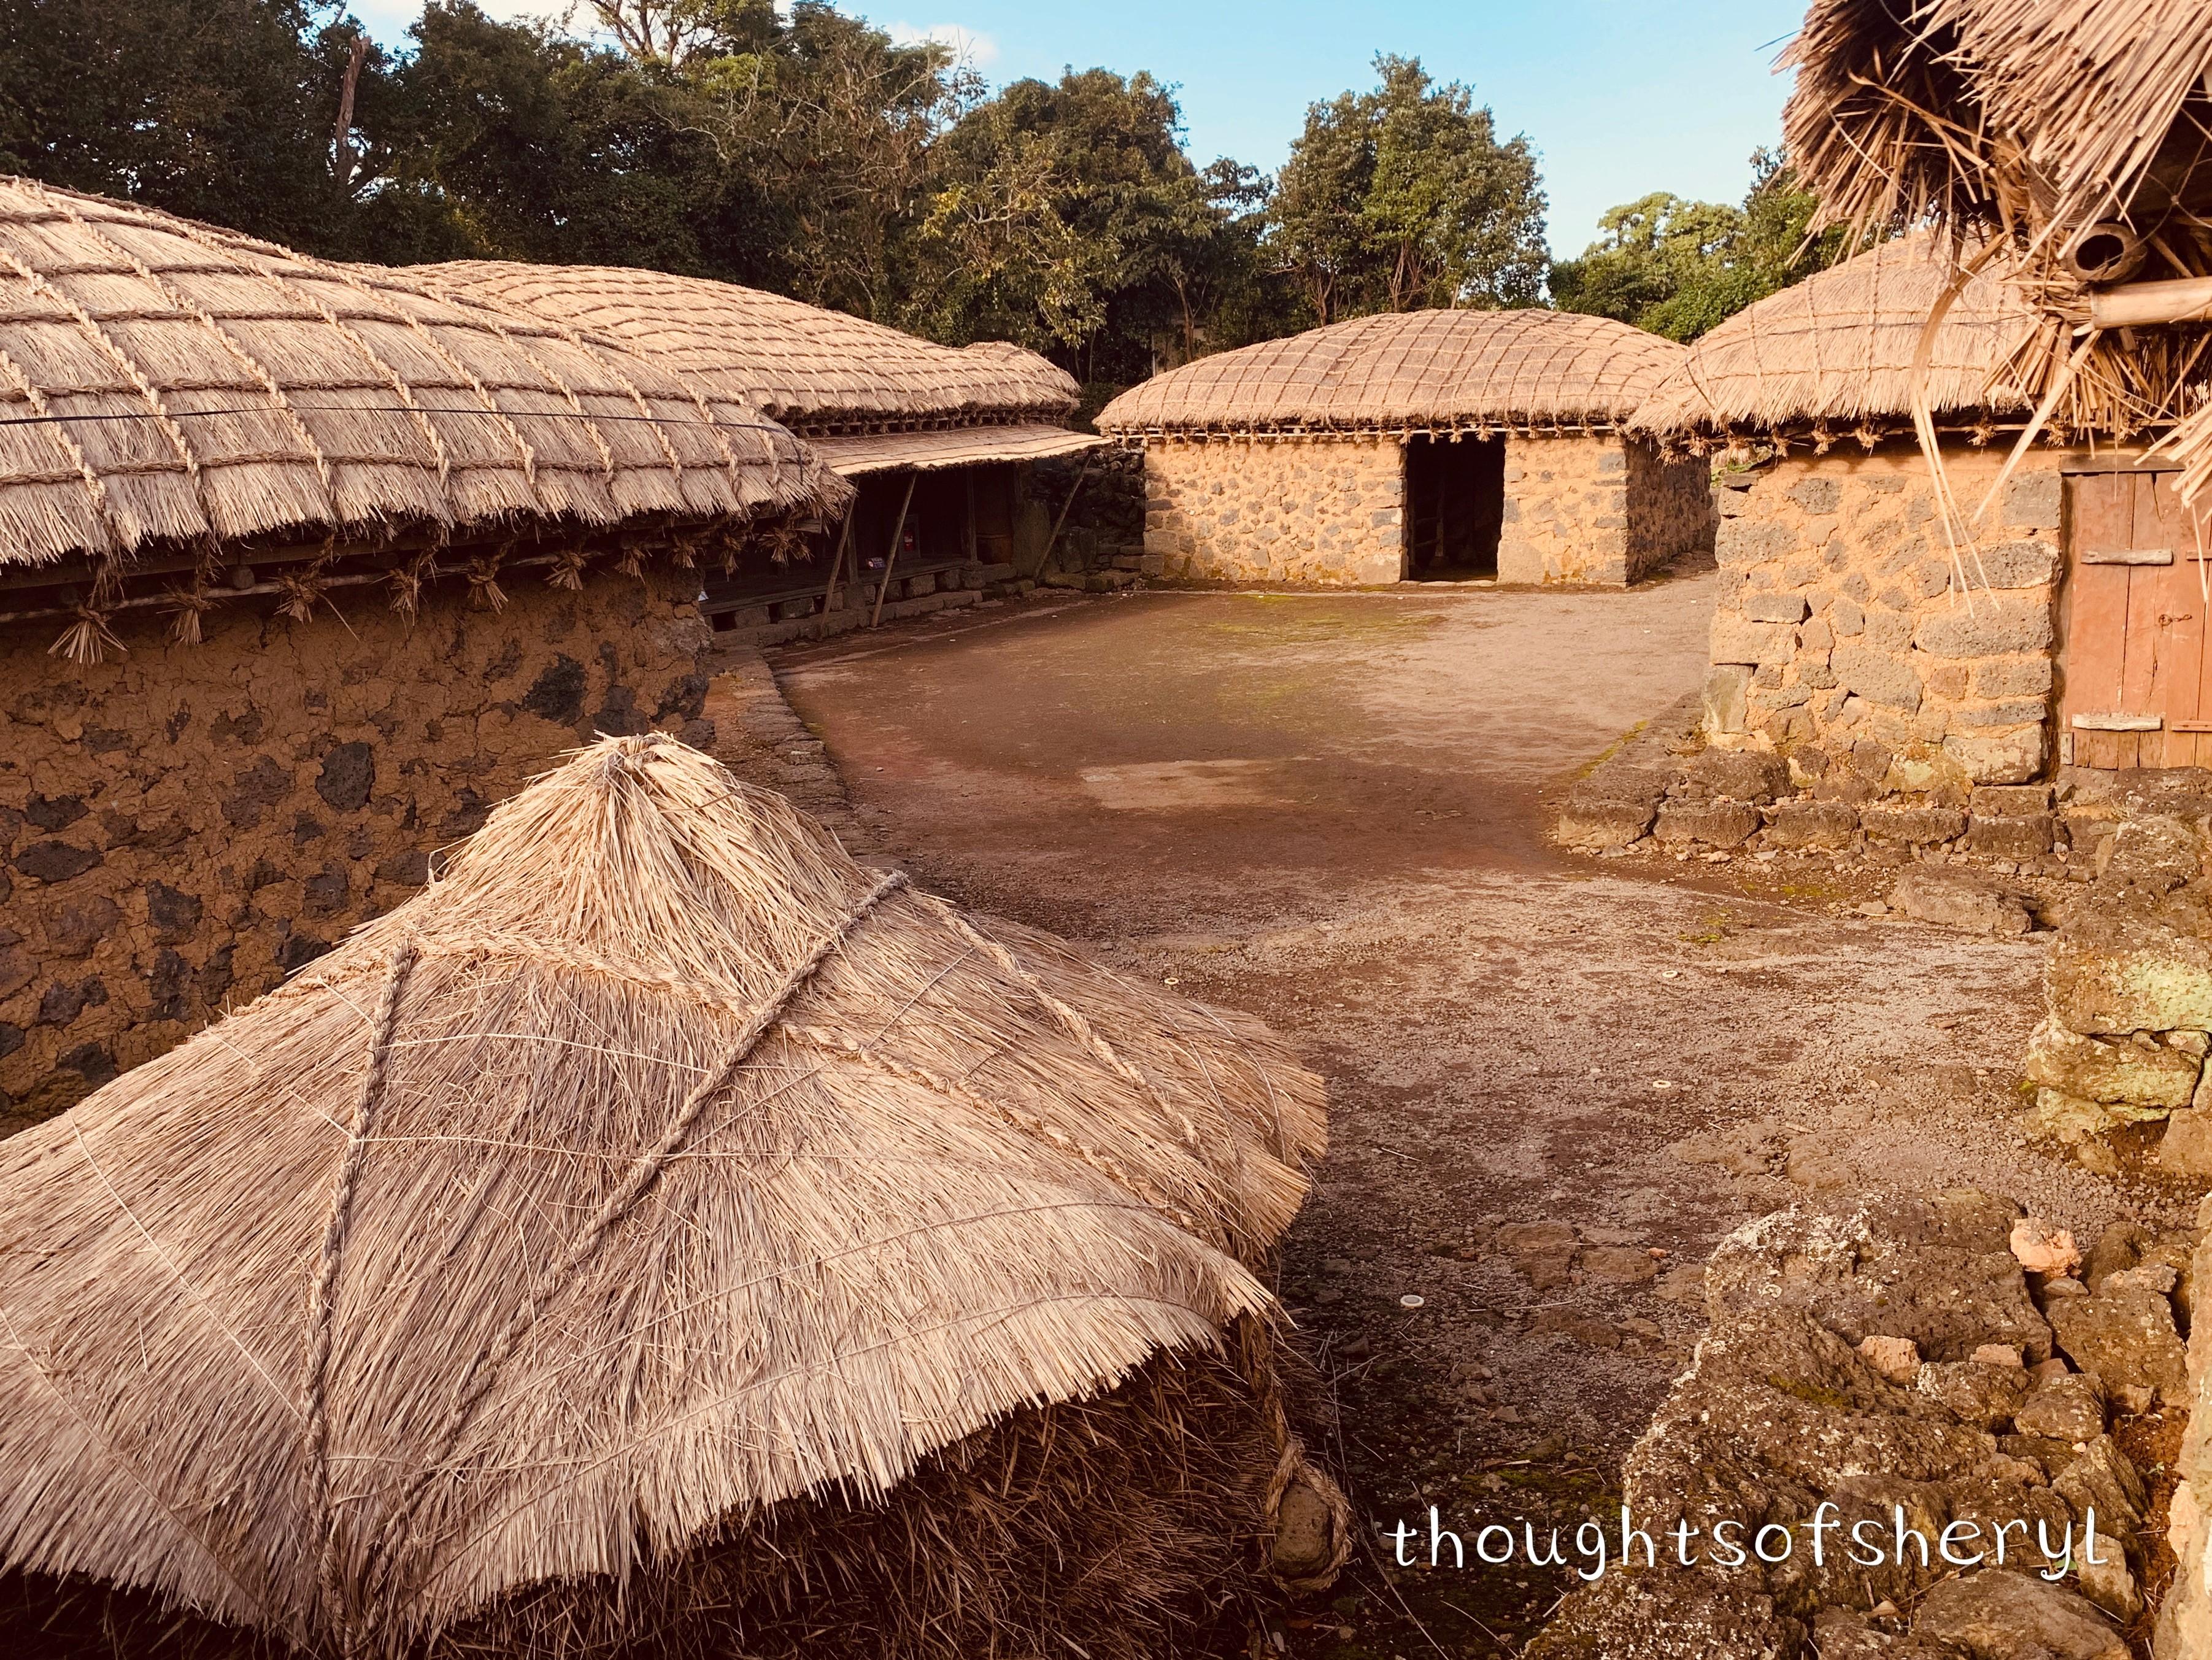 seongeup folk village jeju